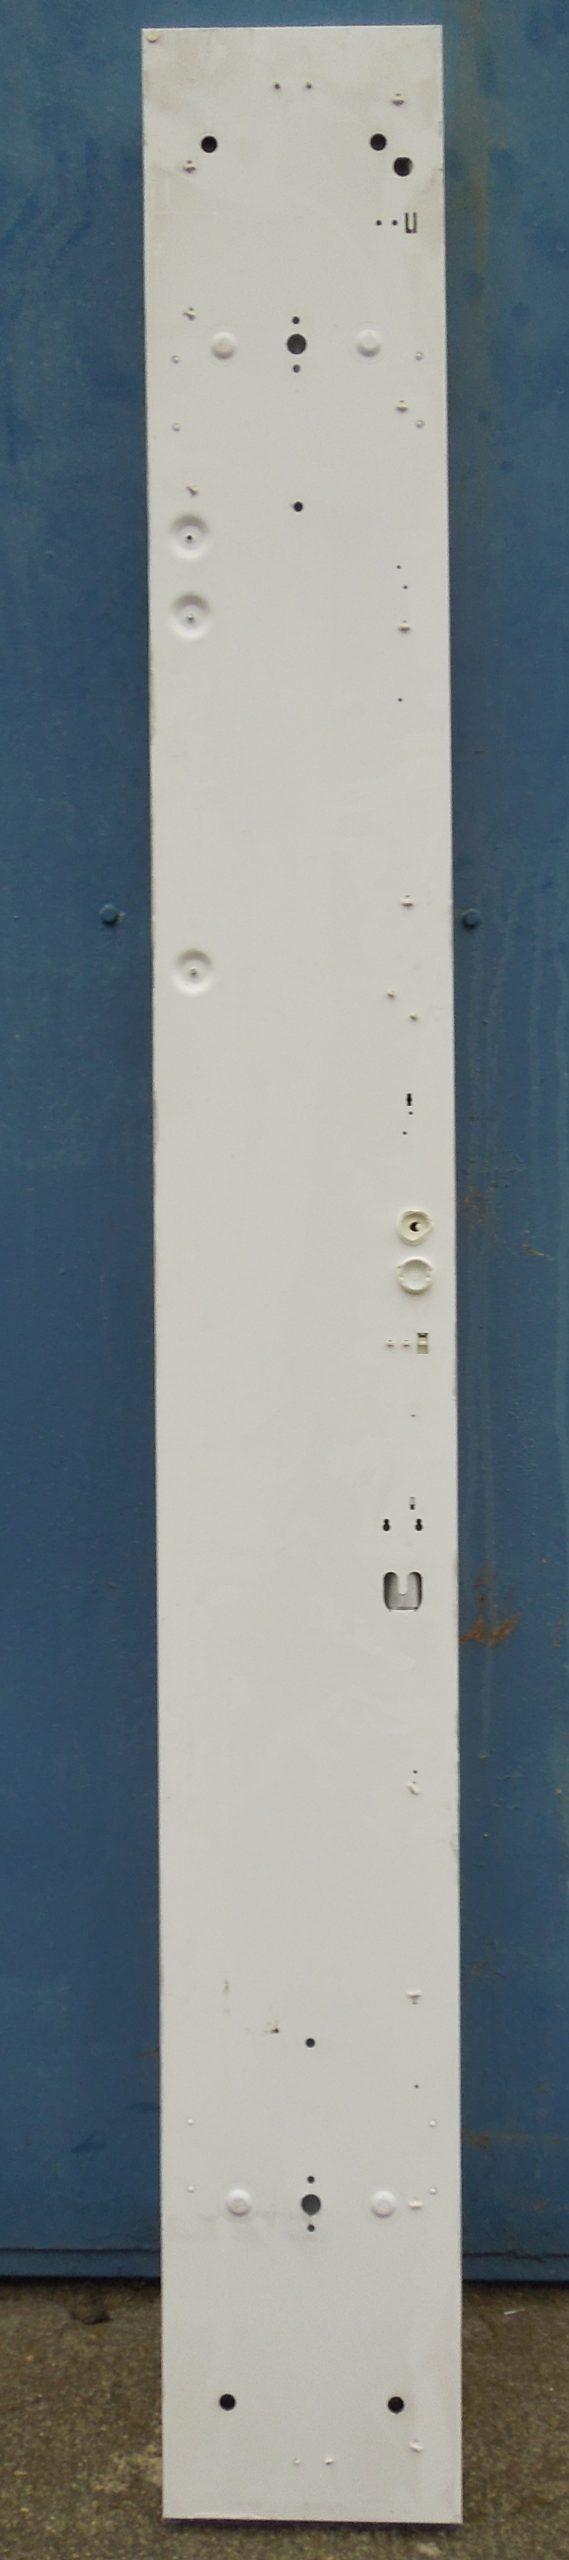 Rasterleuchte 2 x 58 W